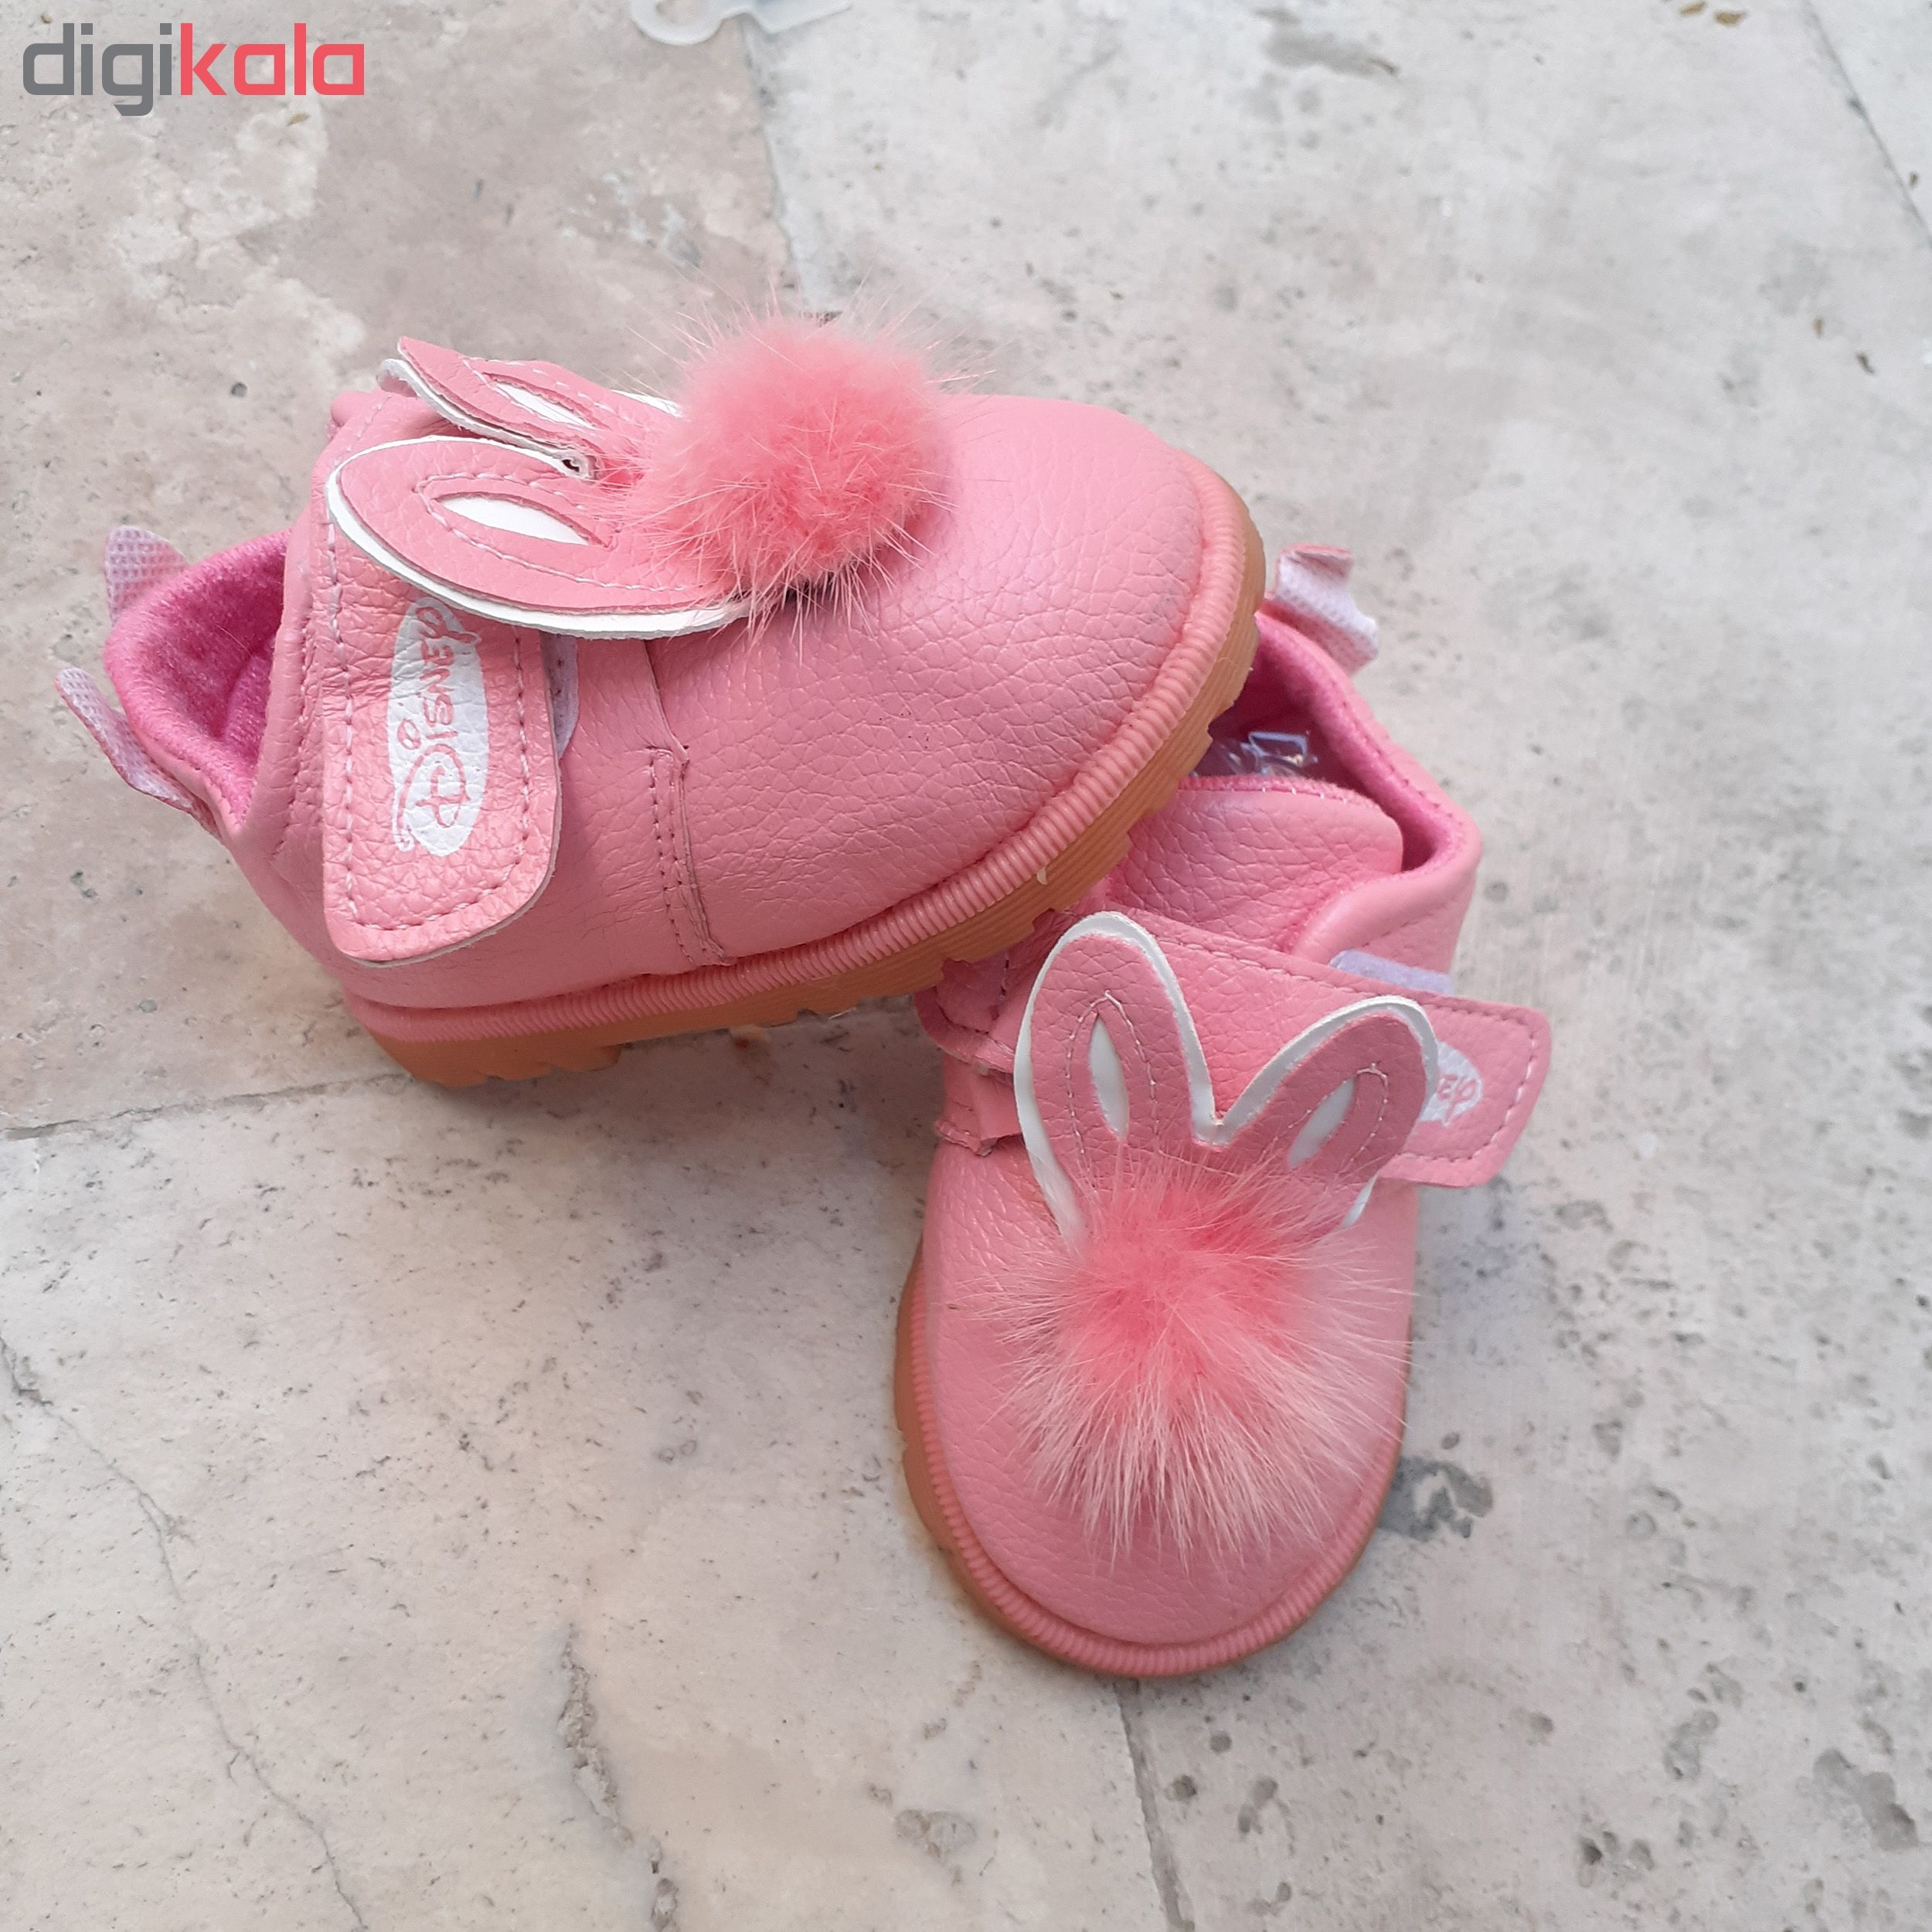 کفش دخترانه دیزنی کد k89